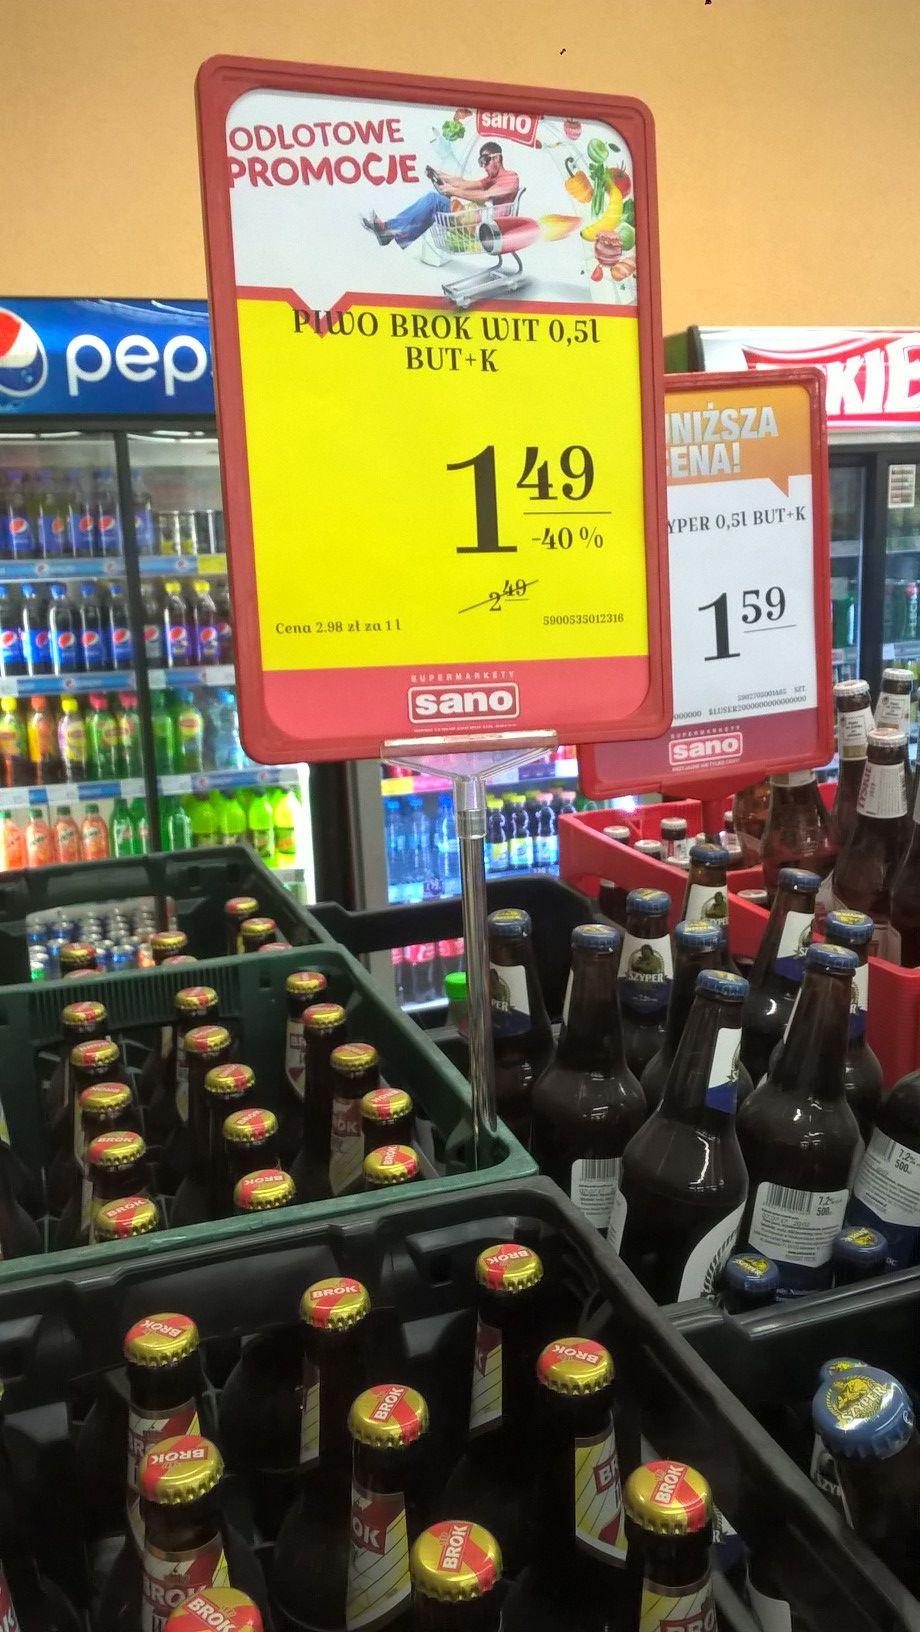 Piwo BROK Wit 500ml, butelka zwrotna